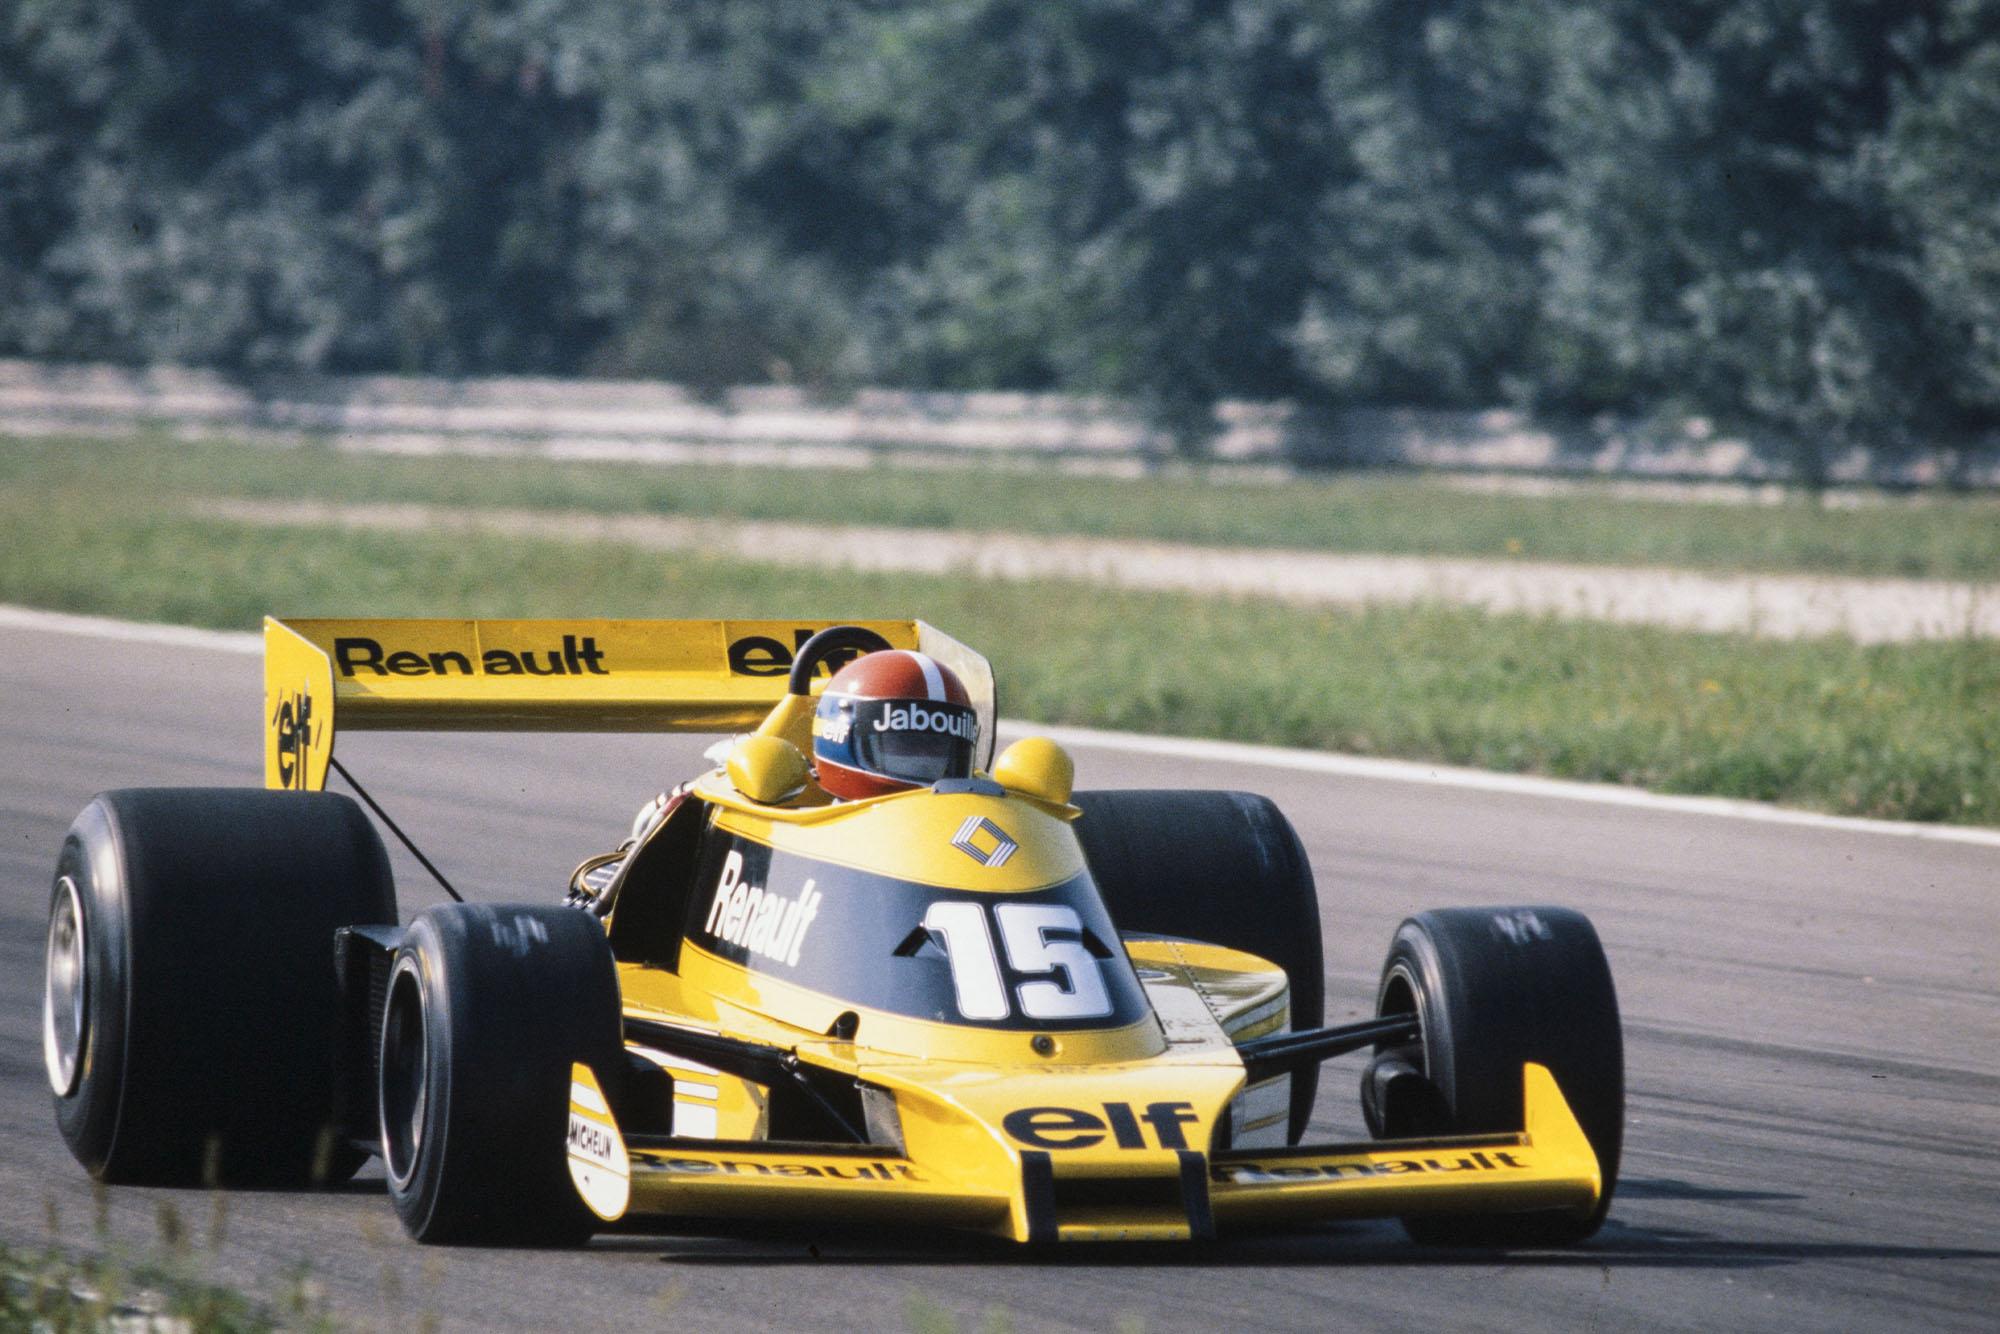 Jean-Pierre Jabouille (Renault) at the 1977 Italian Grand Prix, Monza.